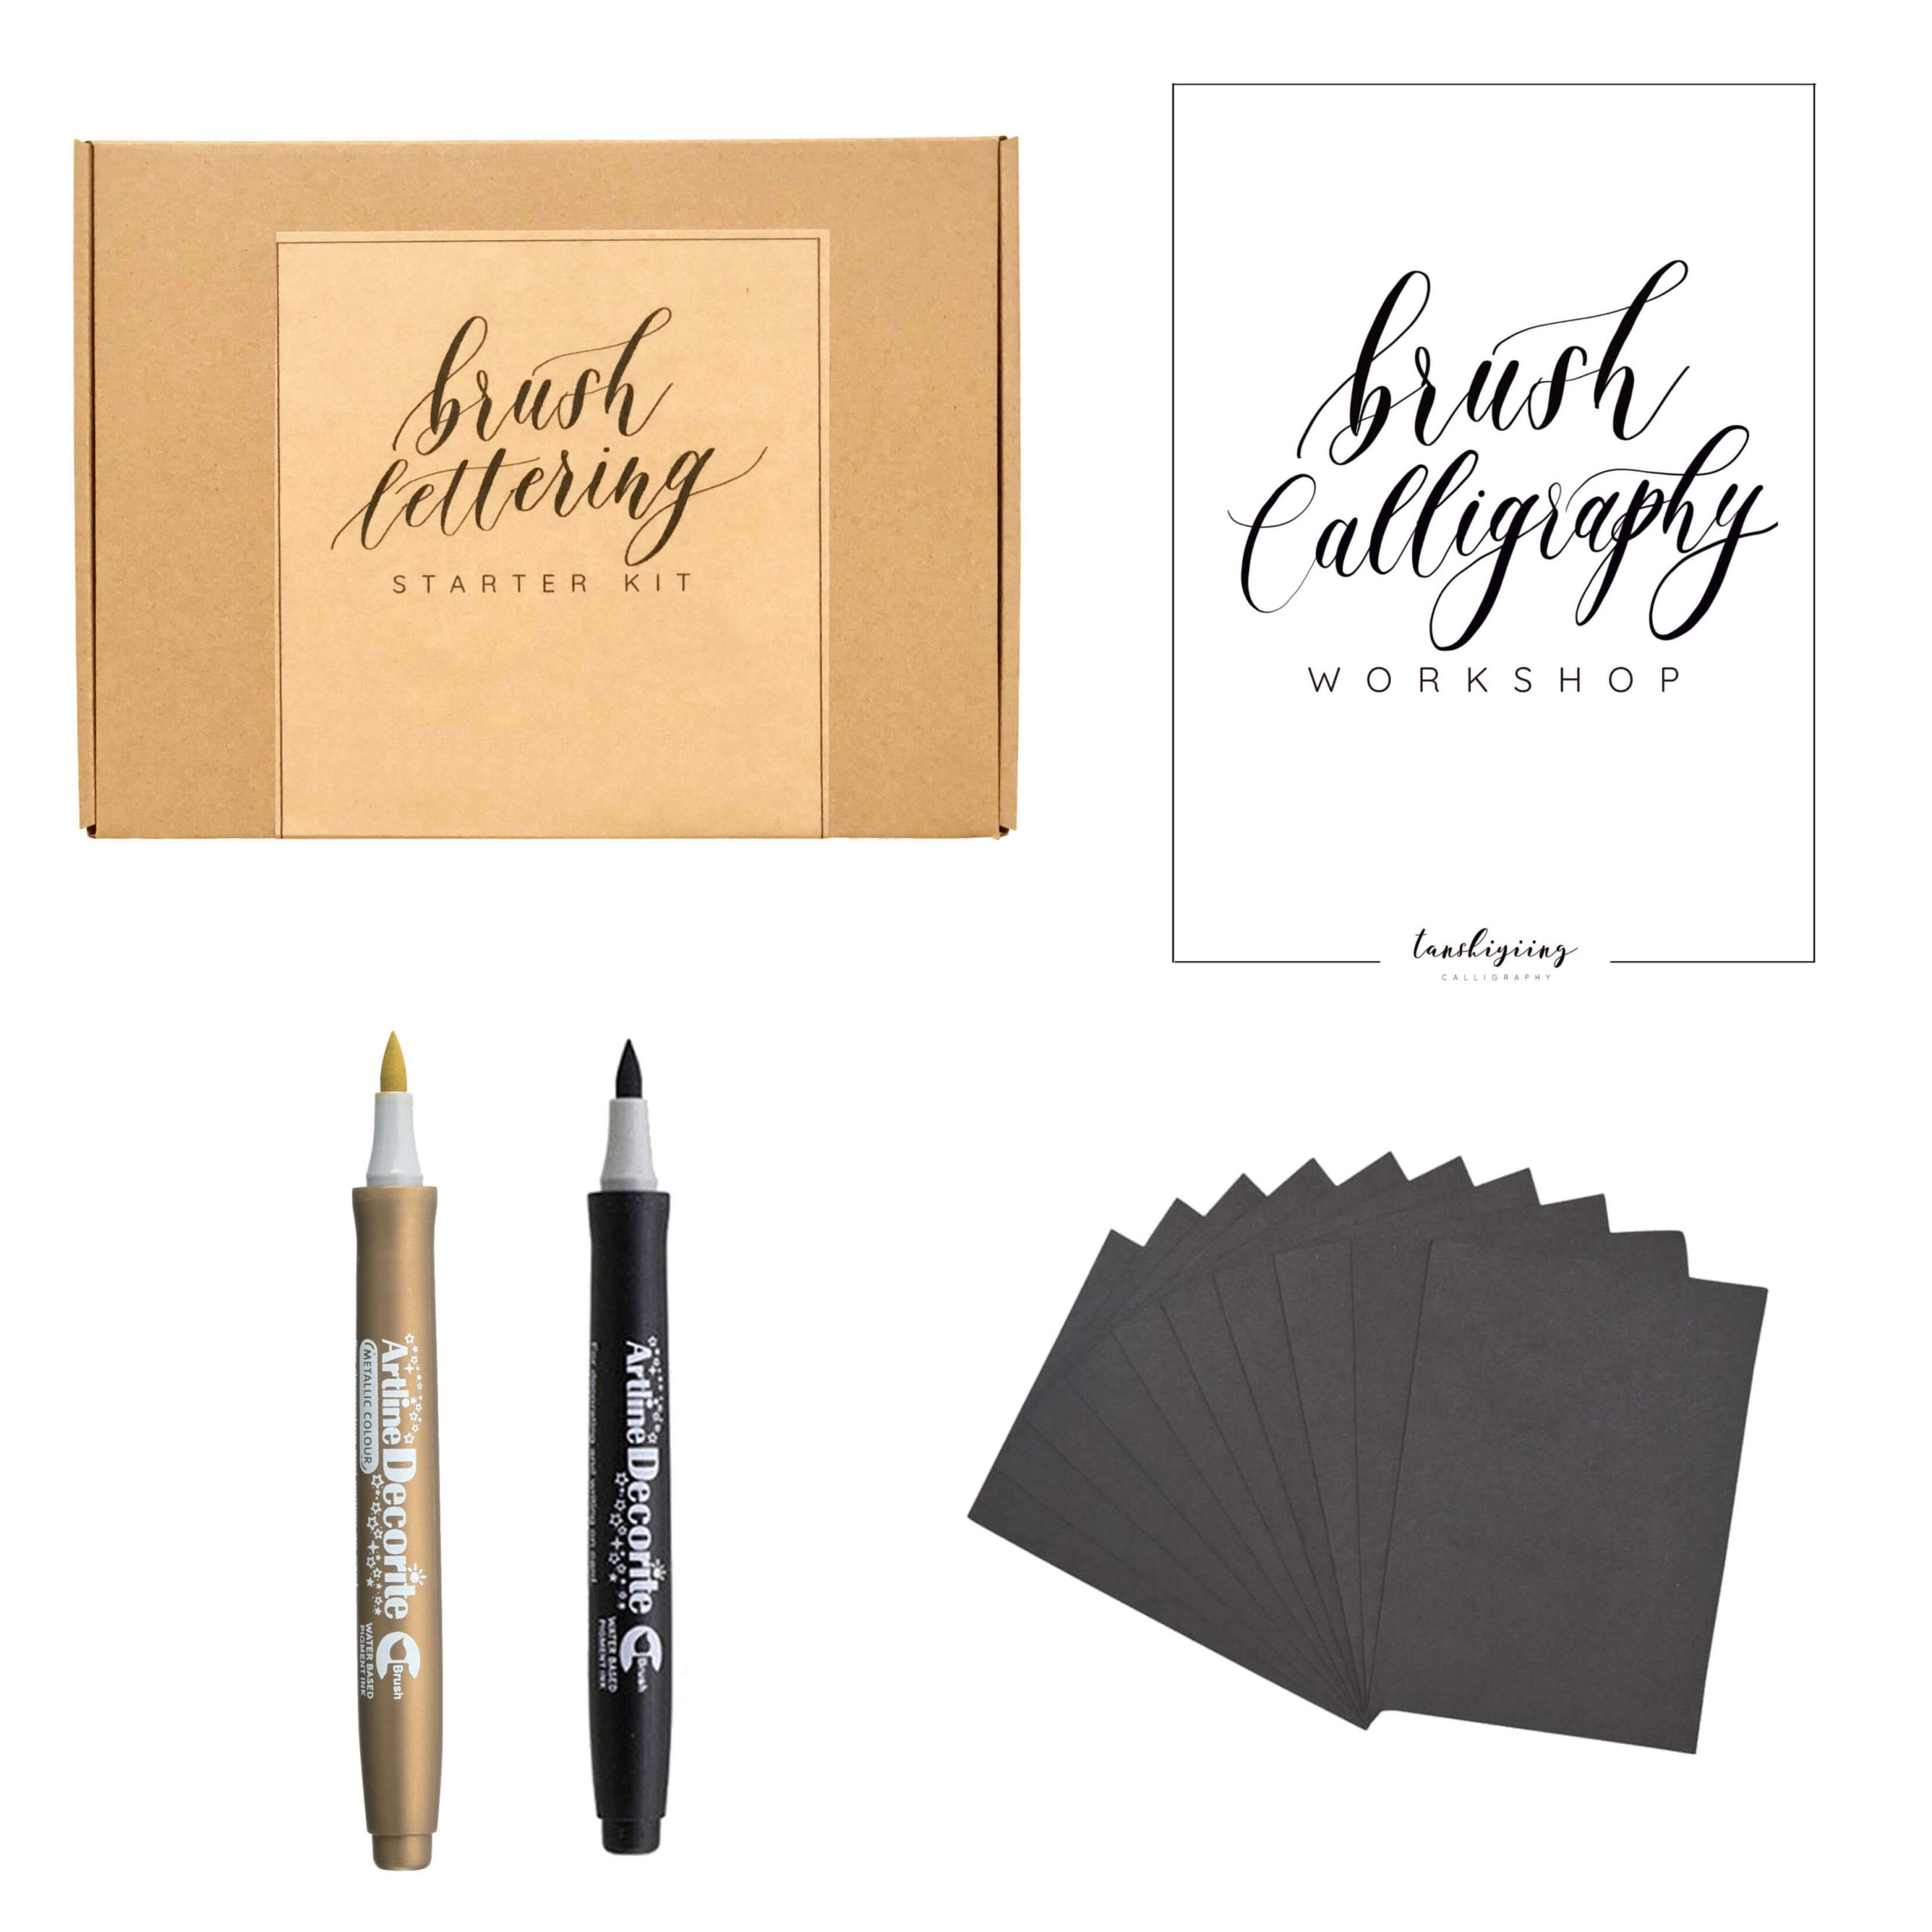 Brush Calligraphy workshop virtual team building